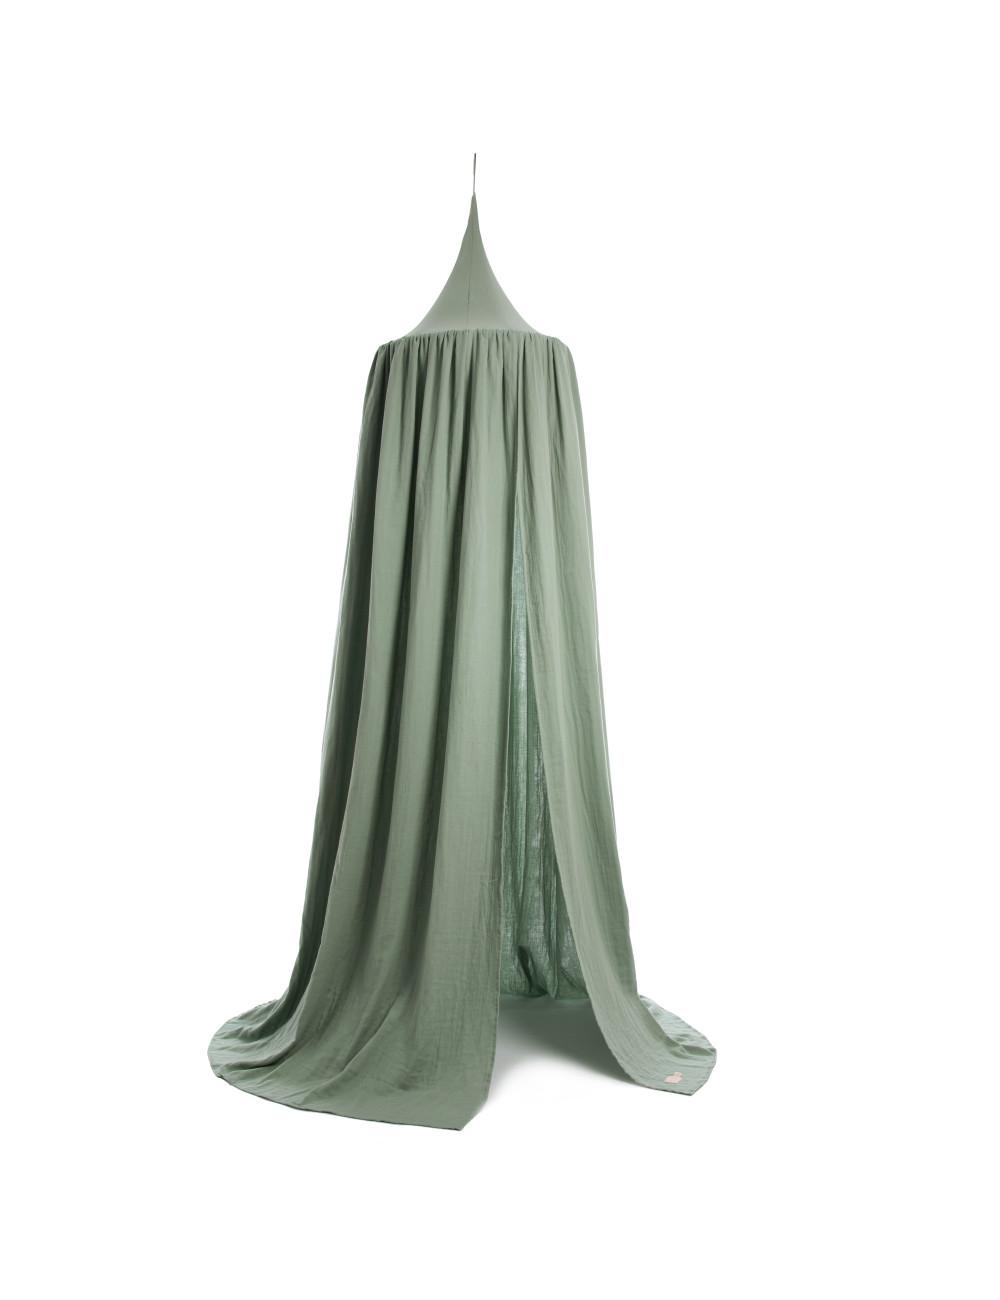 Bedhemeltje Amour | eden green